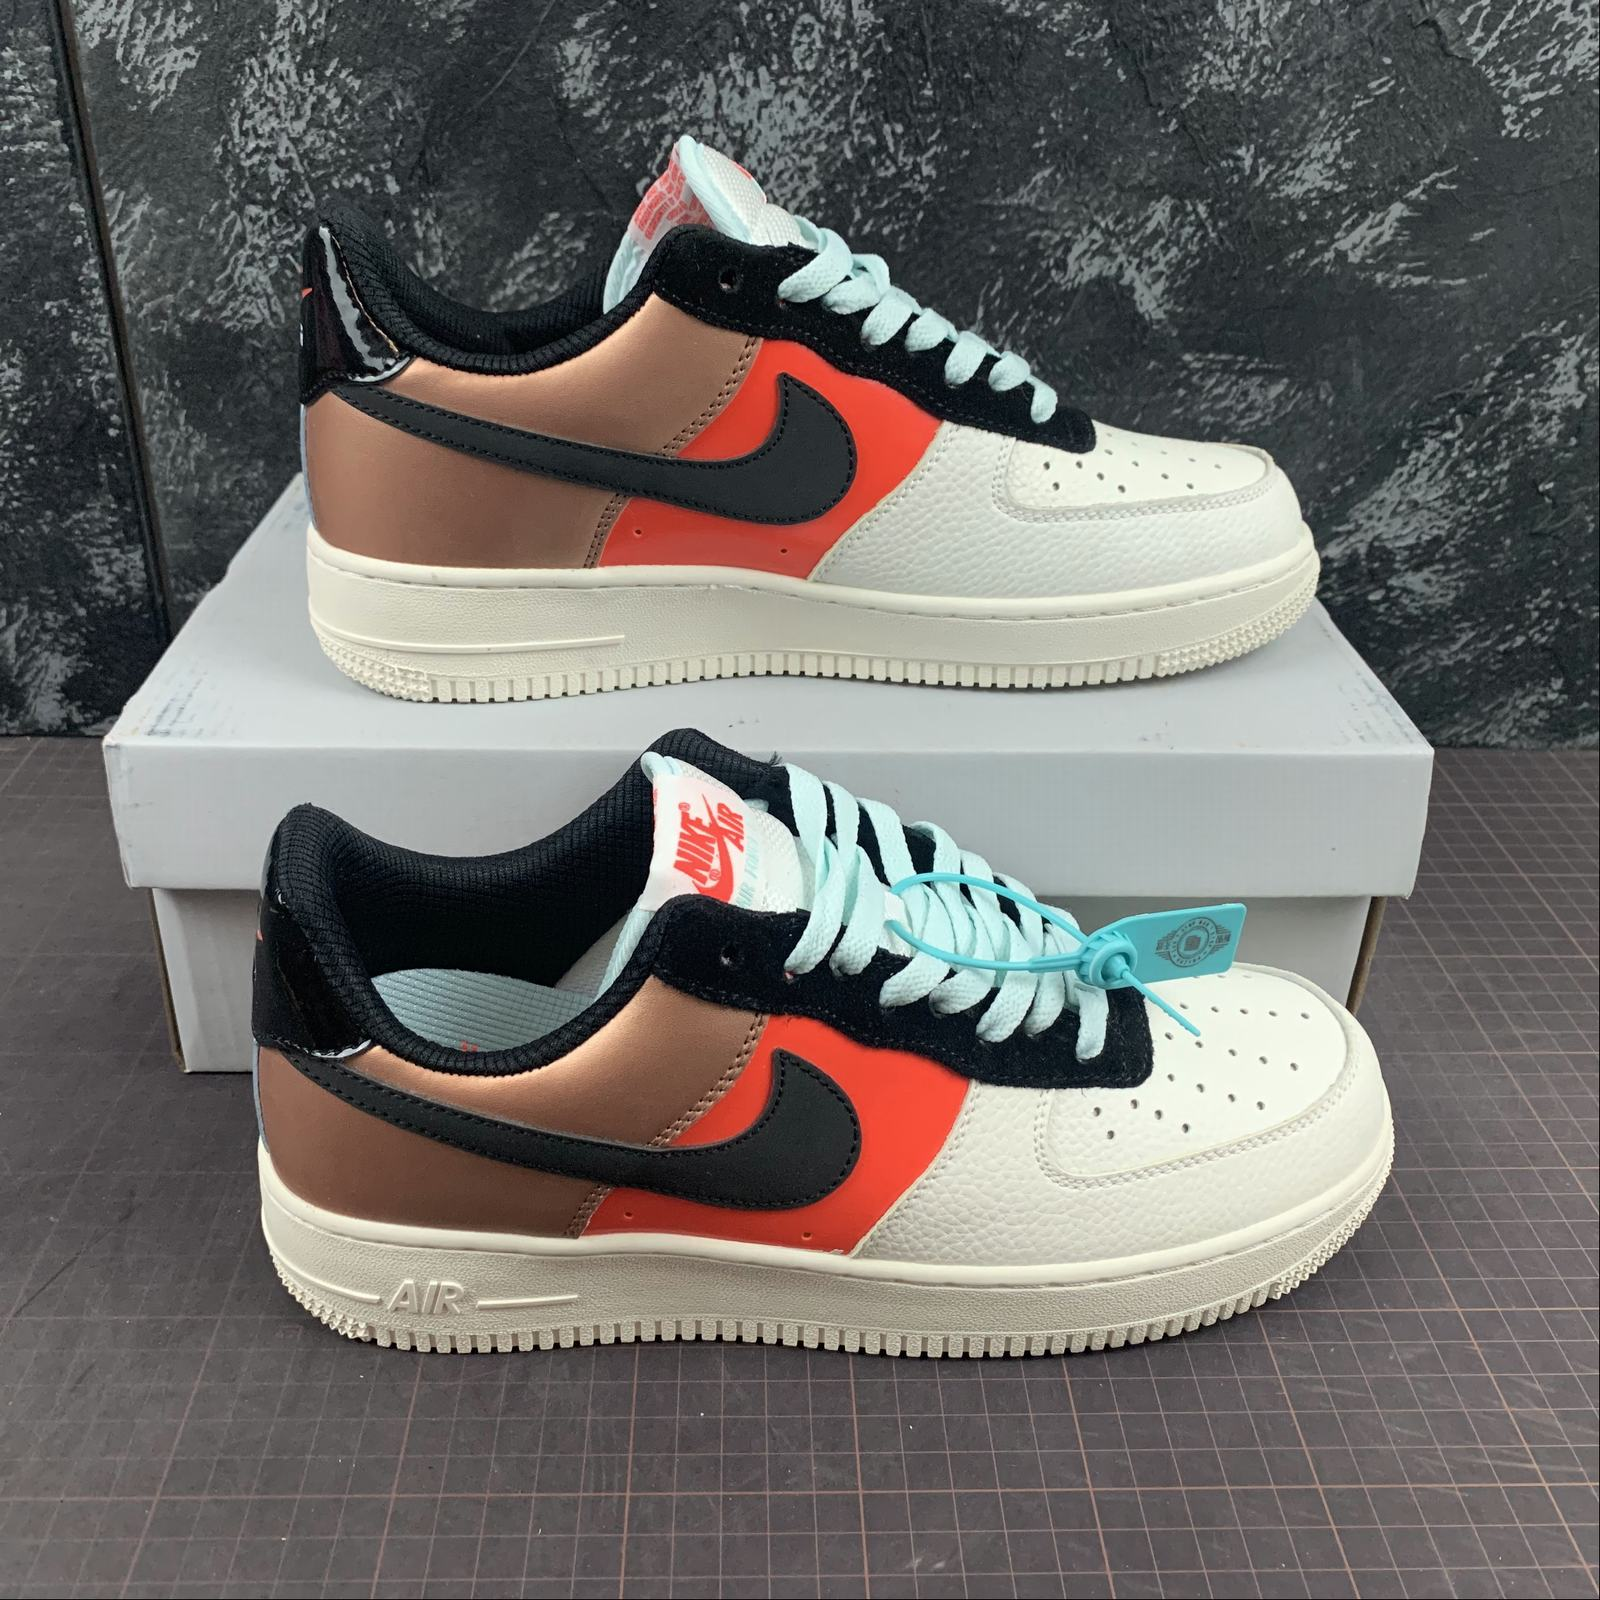 giay-sneaker-nike-air-force-1-07-ct3429-900-da-red-bronze-black